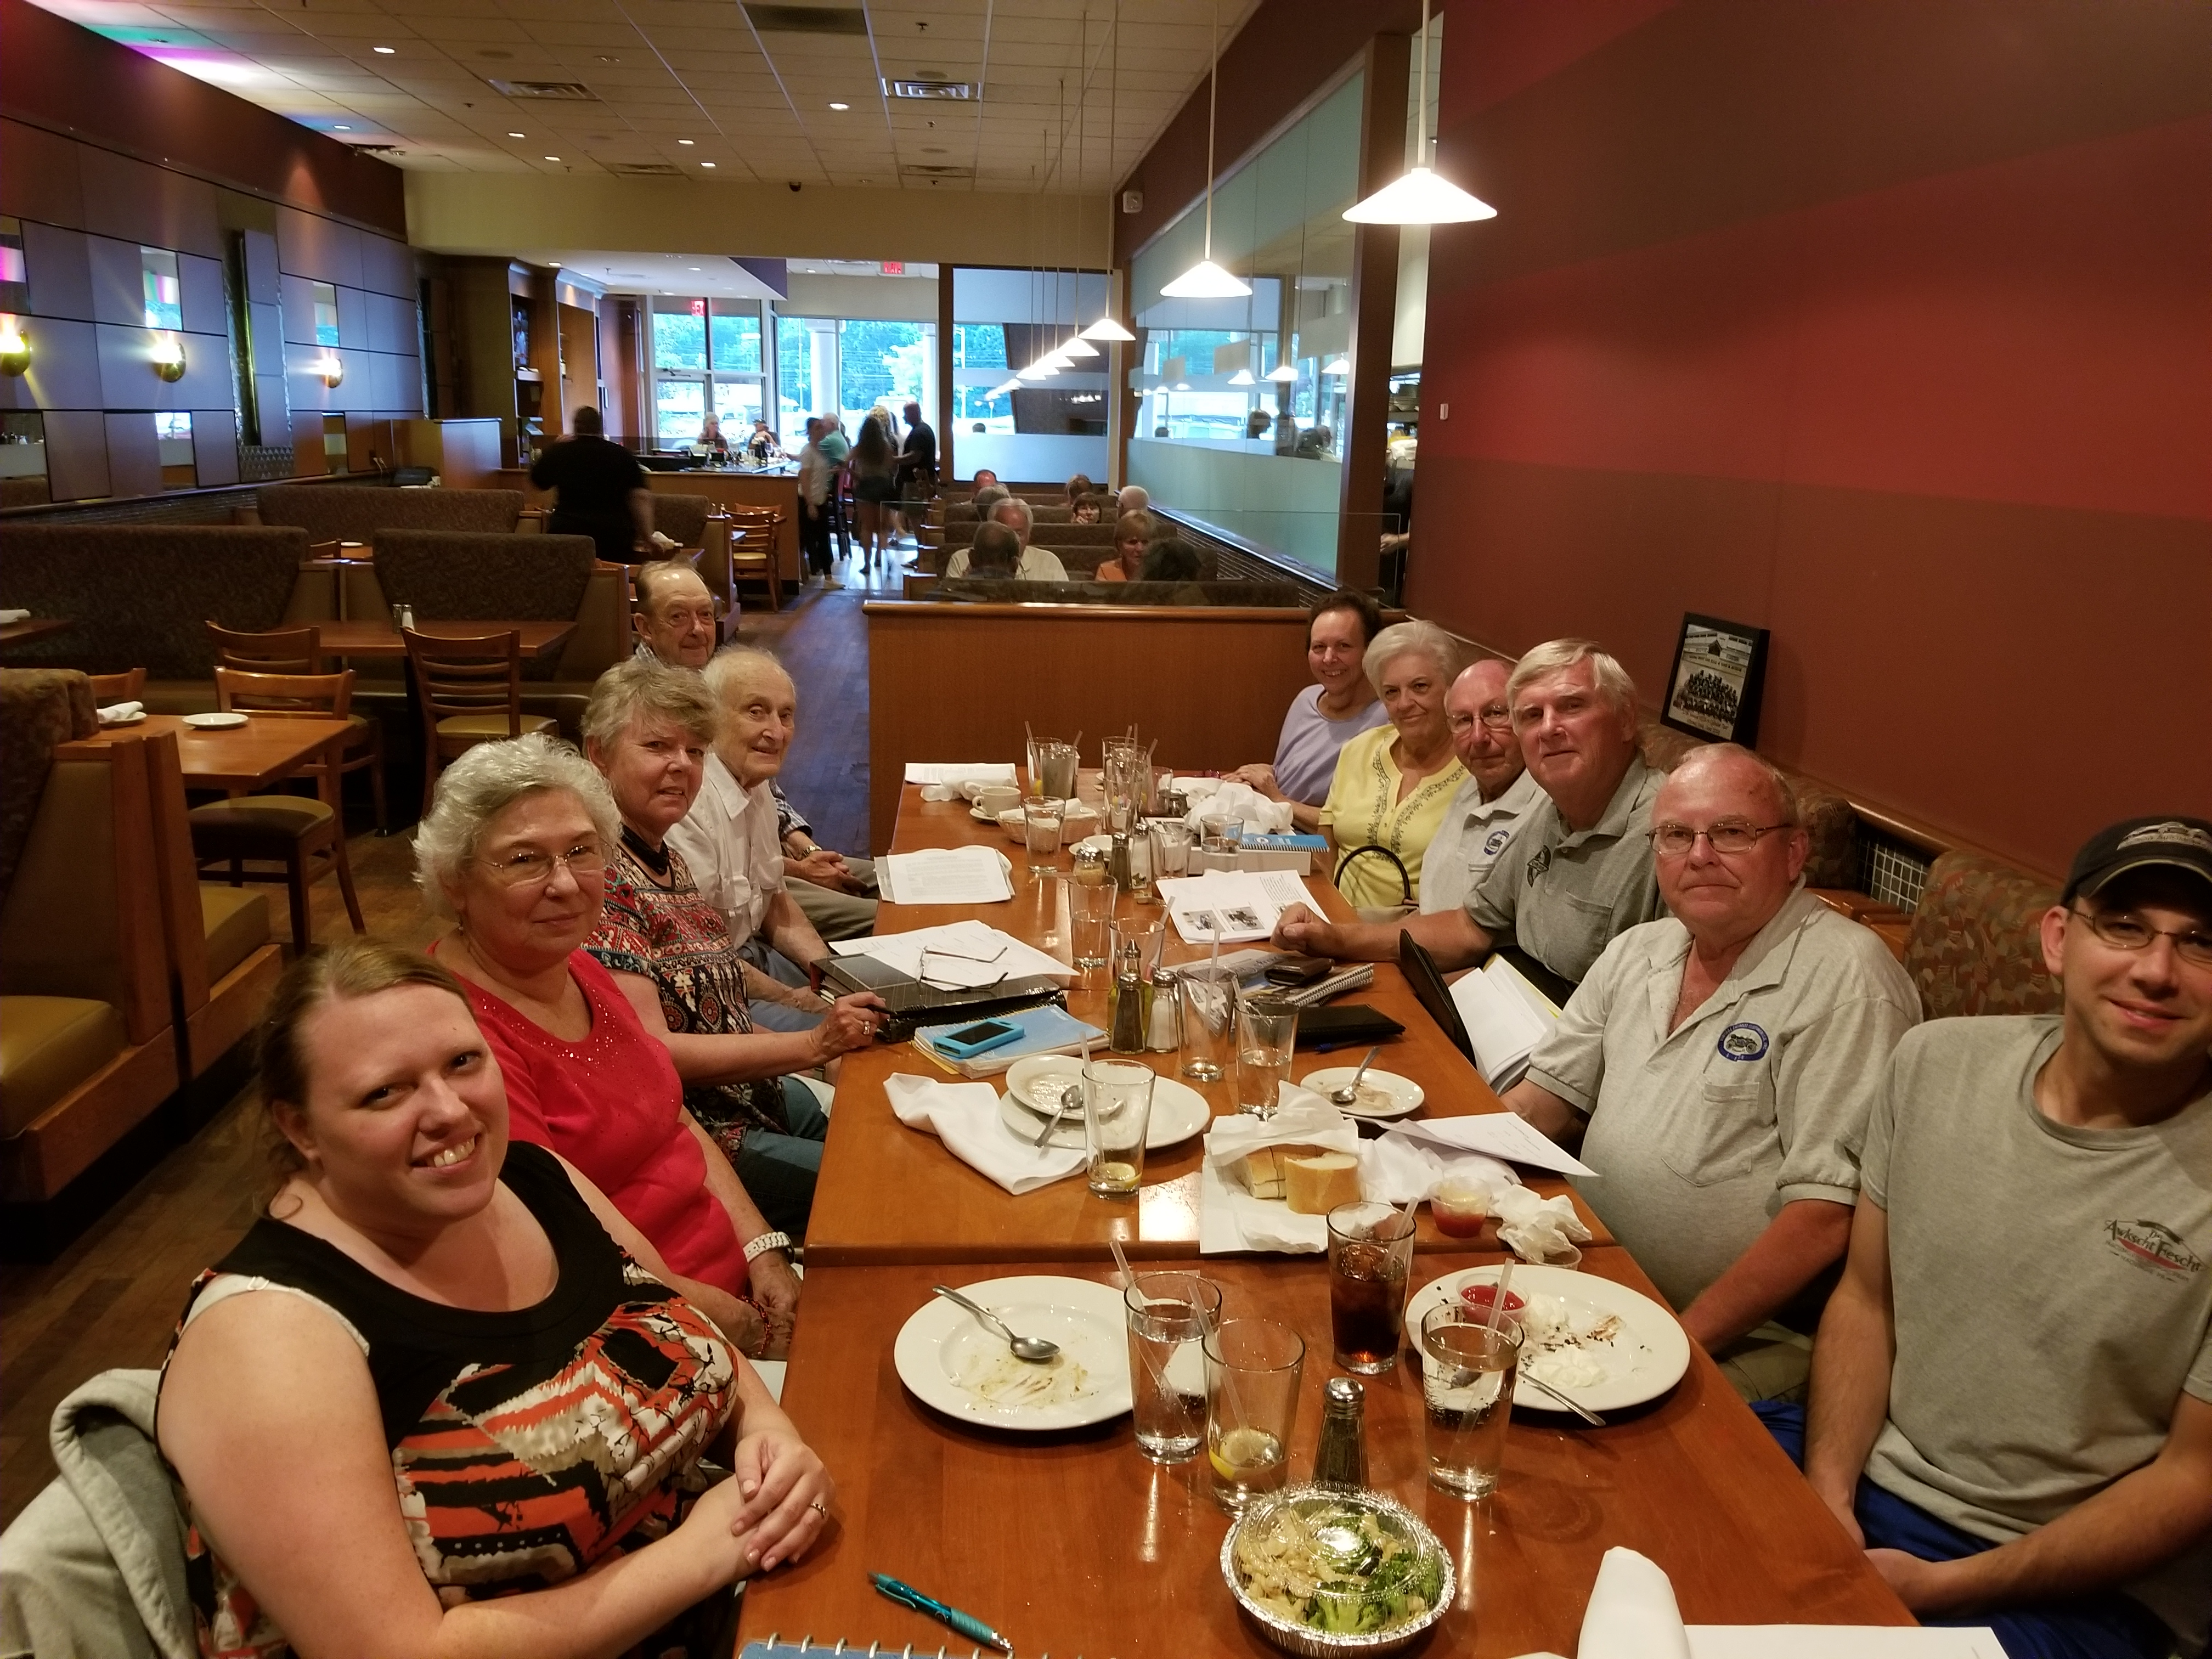 July 10, 2018 Meeting